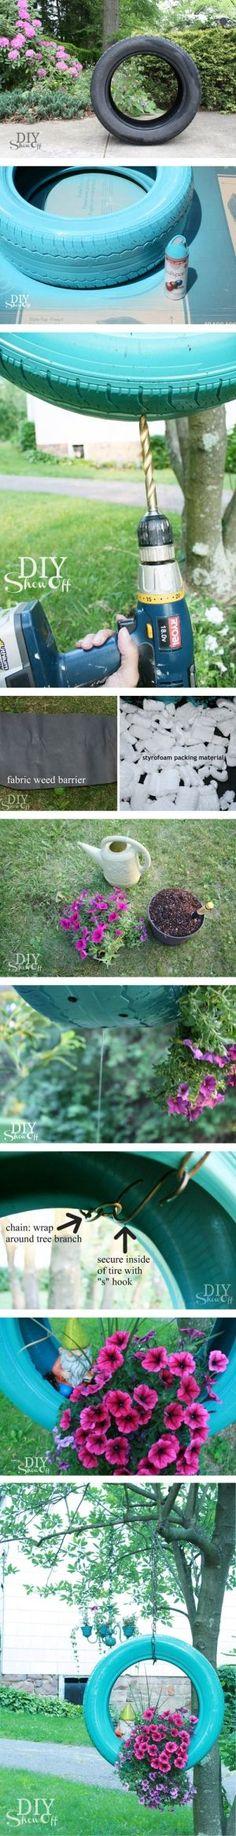 Tire planter: